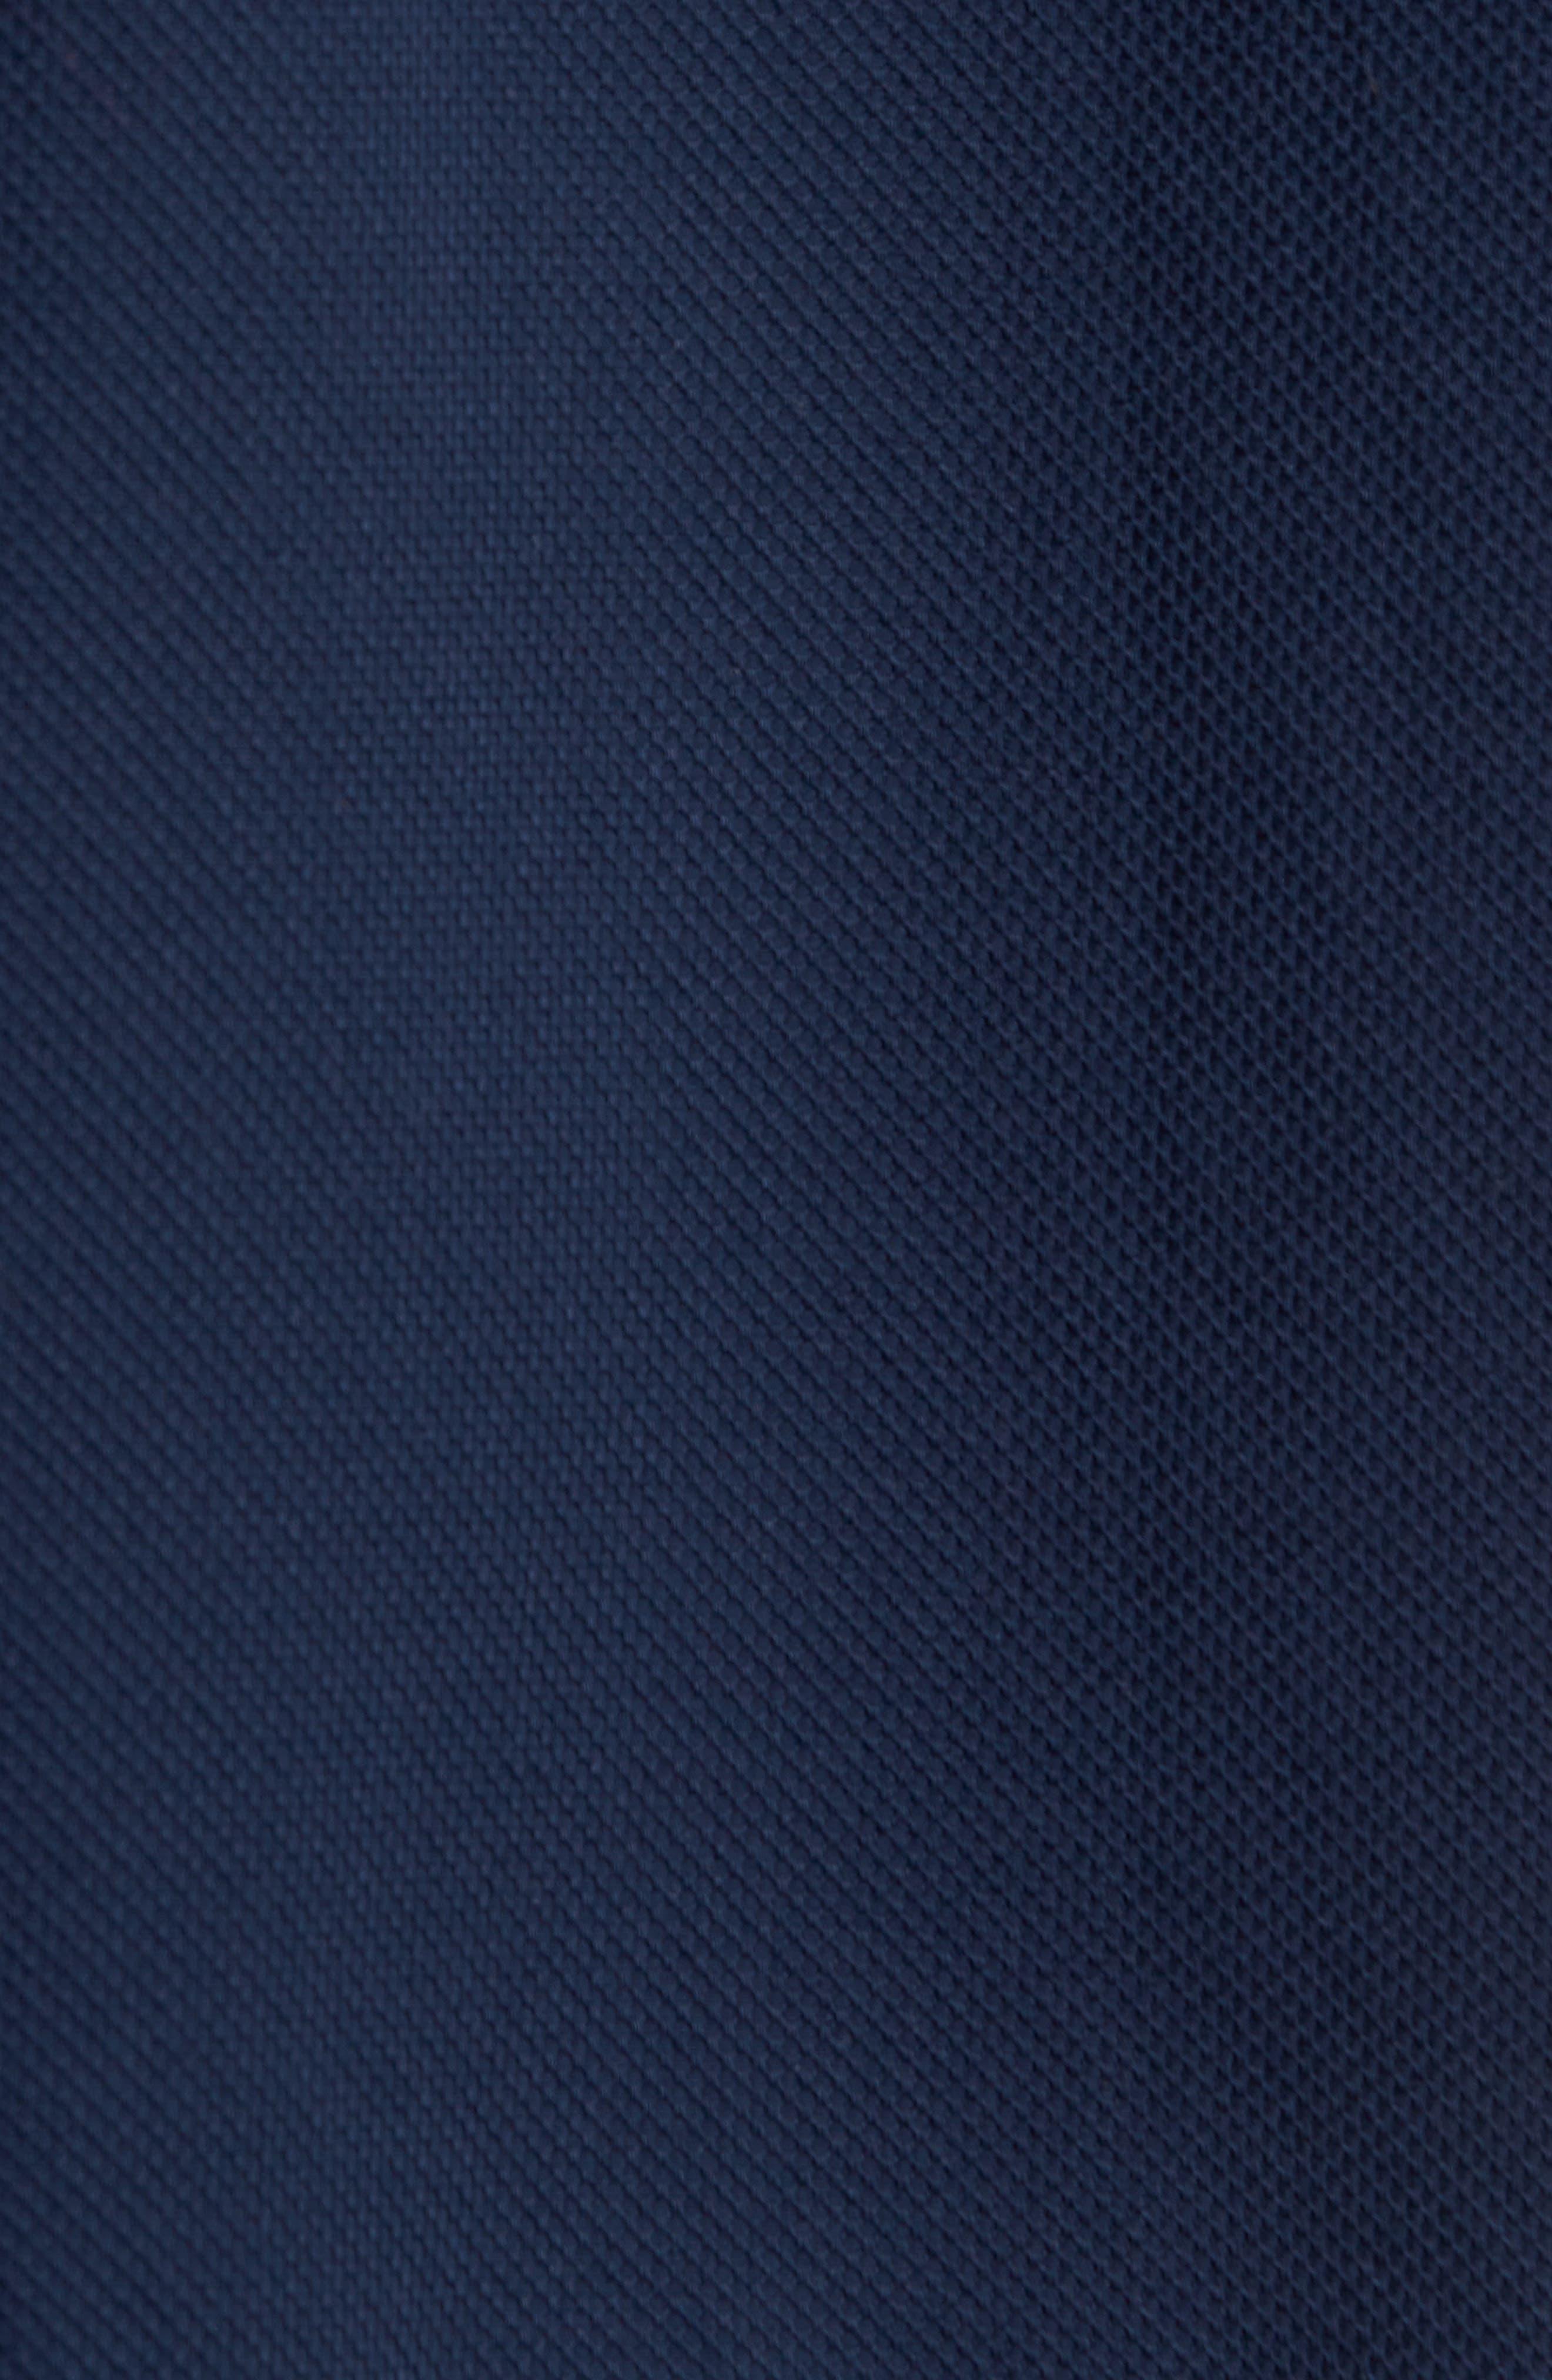 Woven Piqué Shirt,                             Alternate thumbnail 5, color,